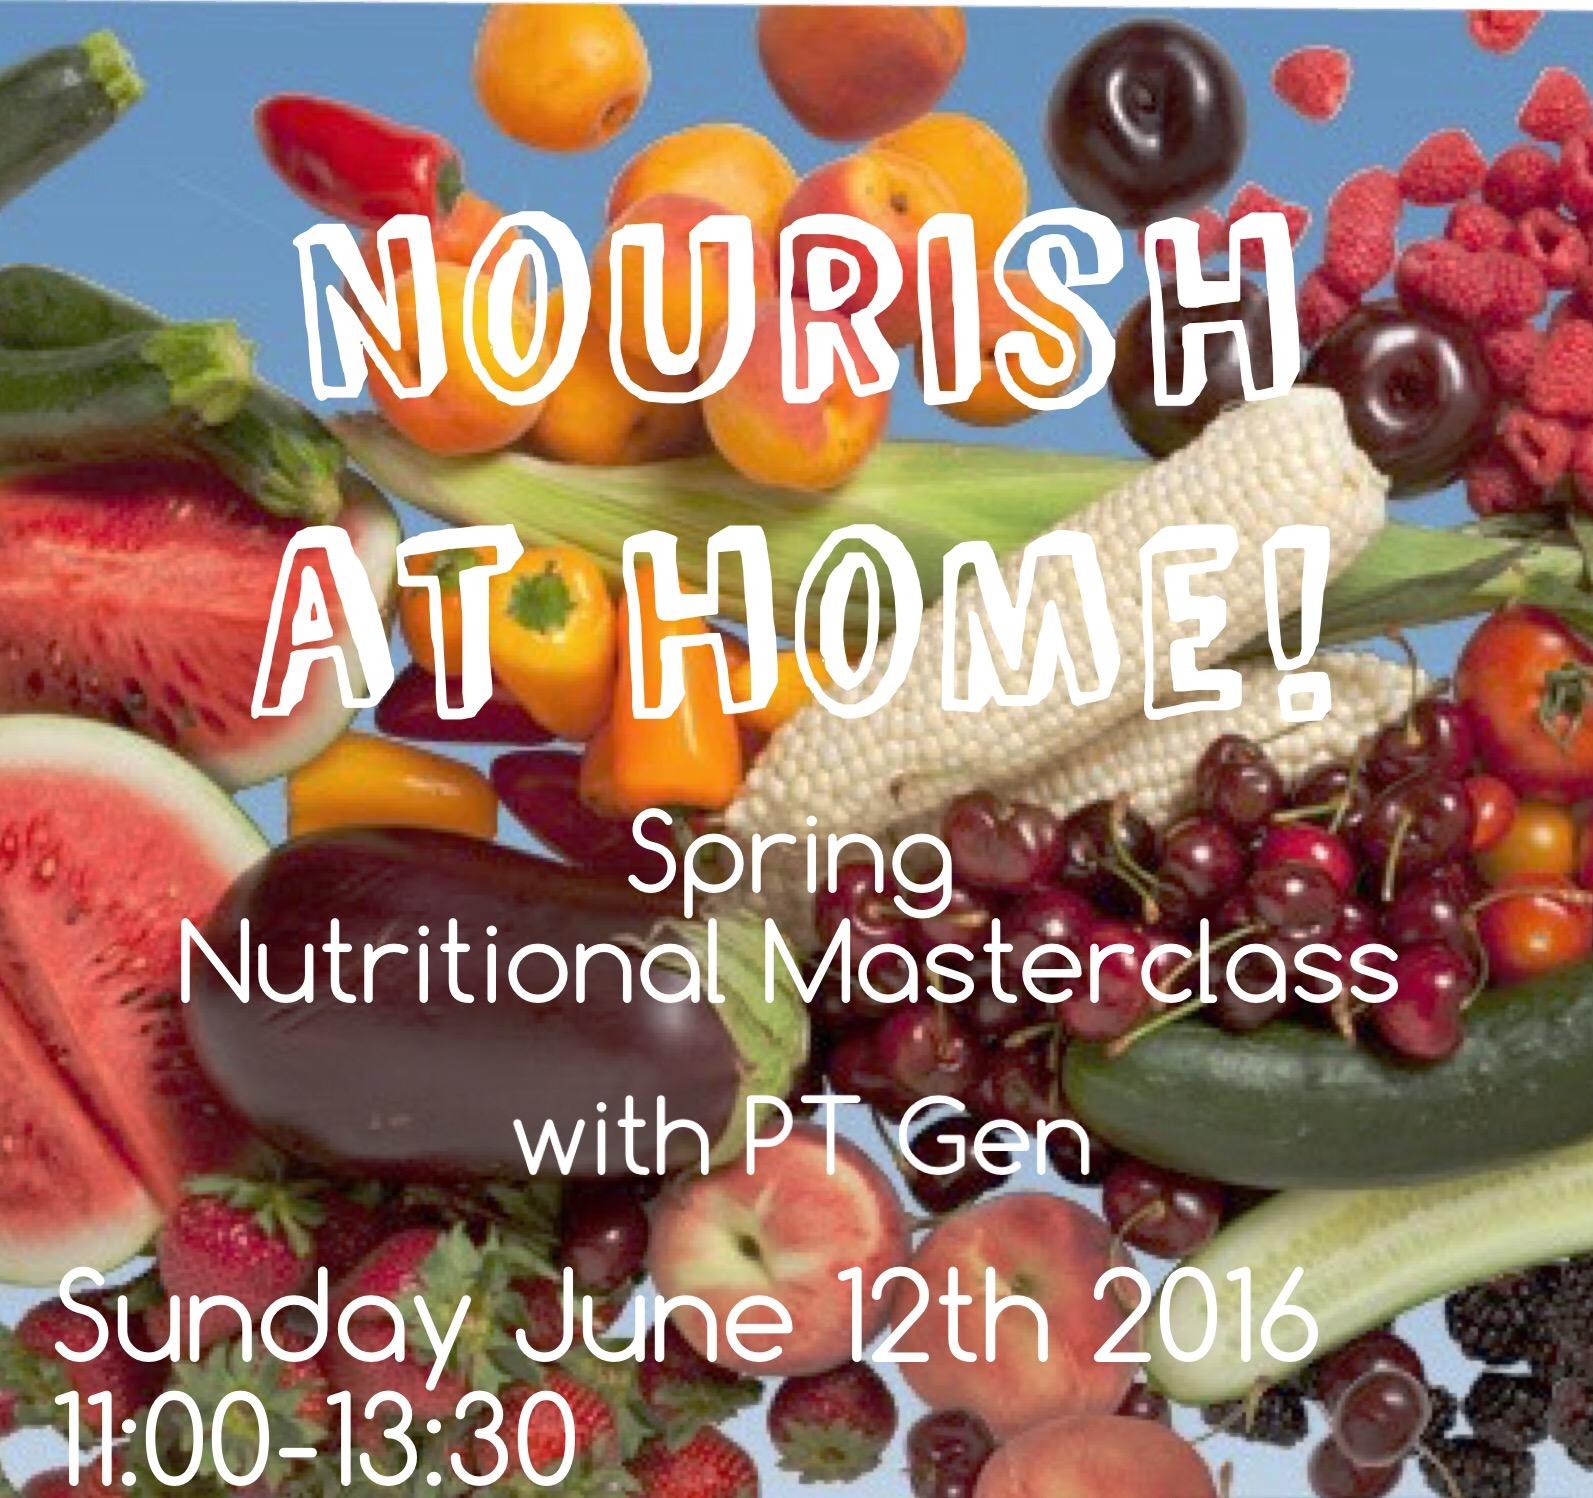 Nourish st a Home Spring: Southampton Personal Trainer Gen Preece